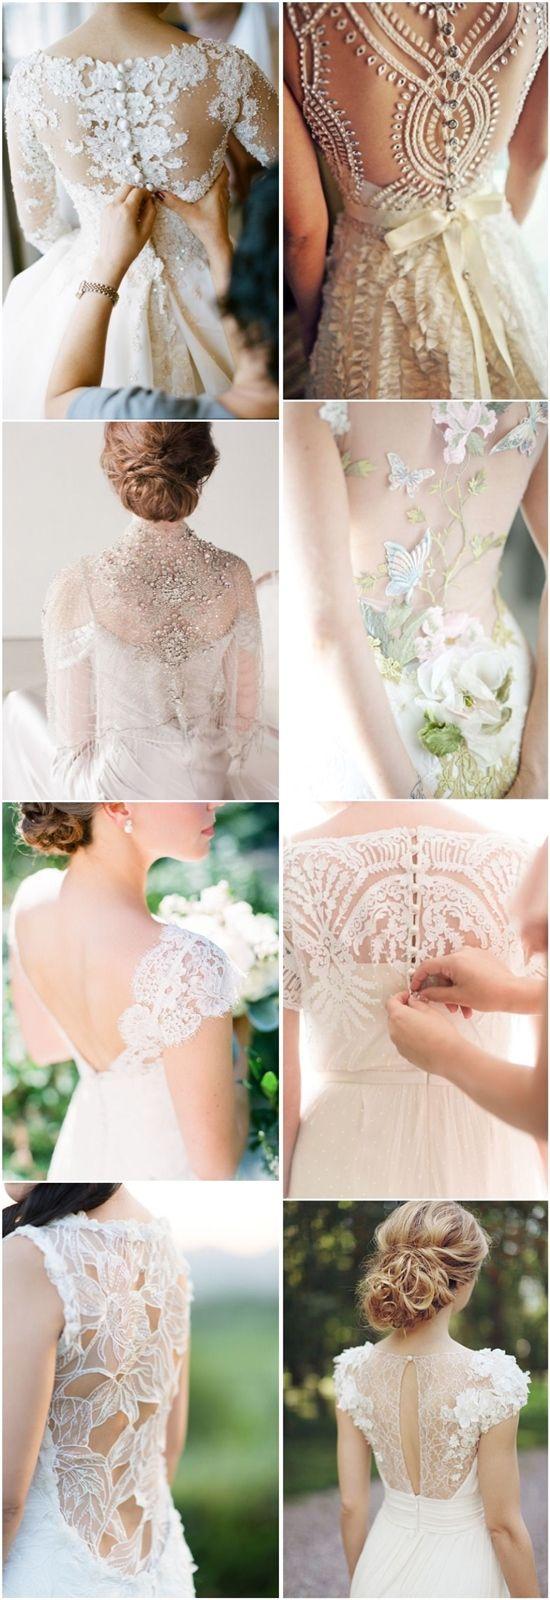 wedding dress back styles we love wedding dress dress lace and